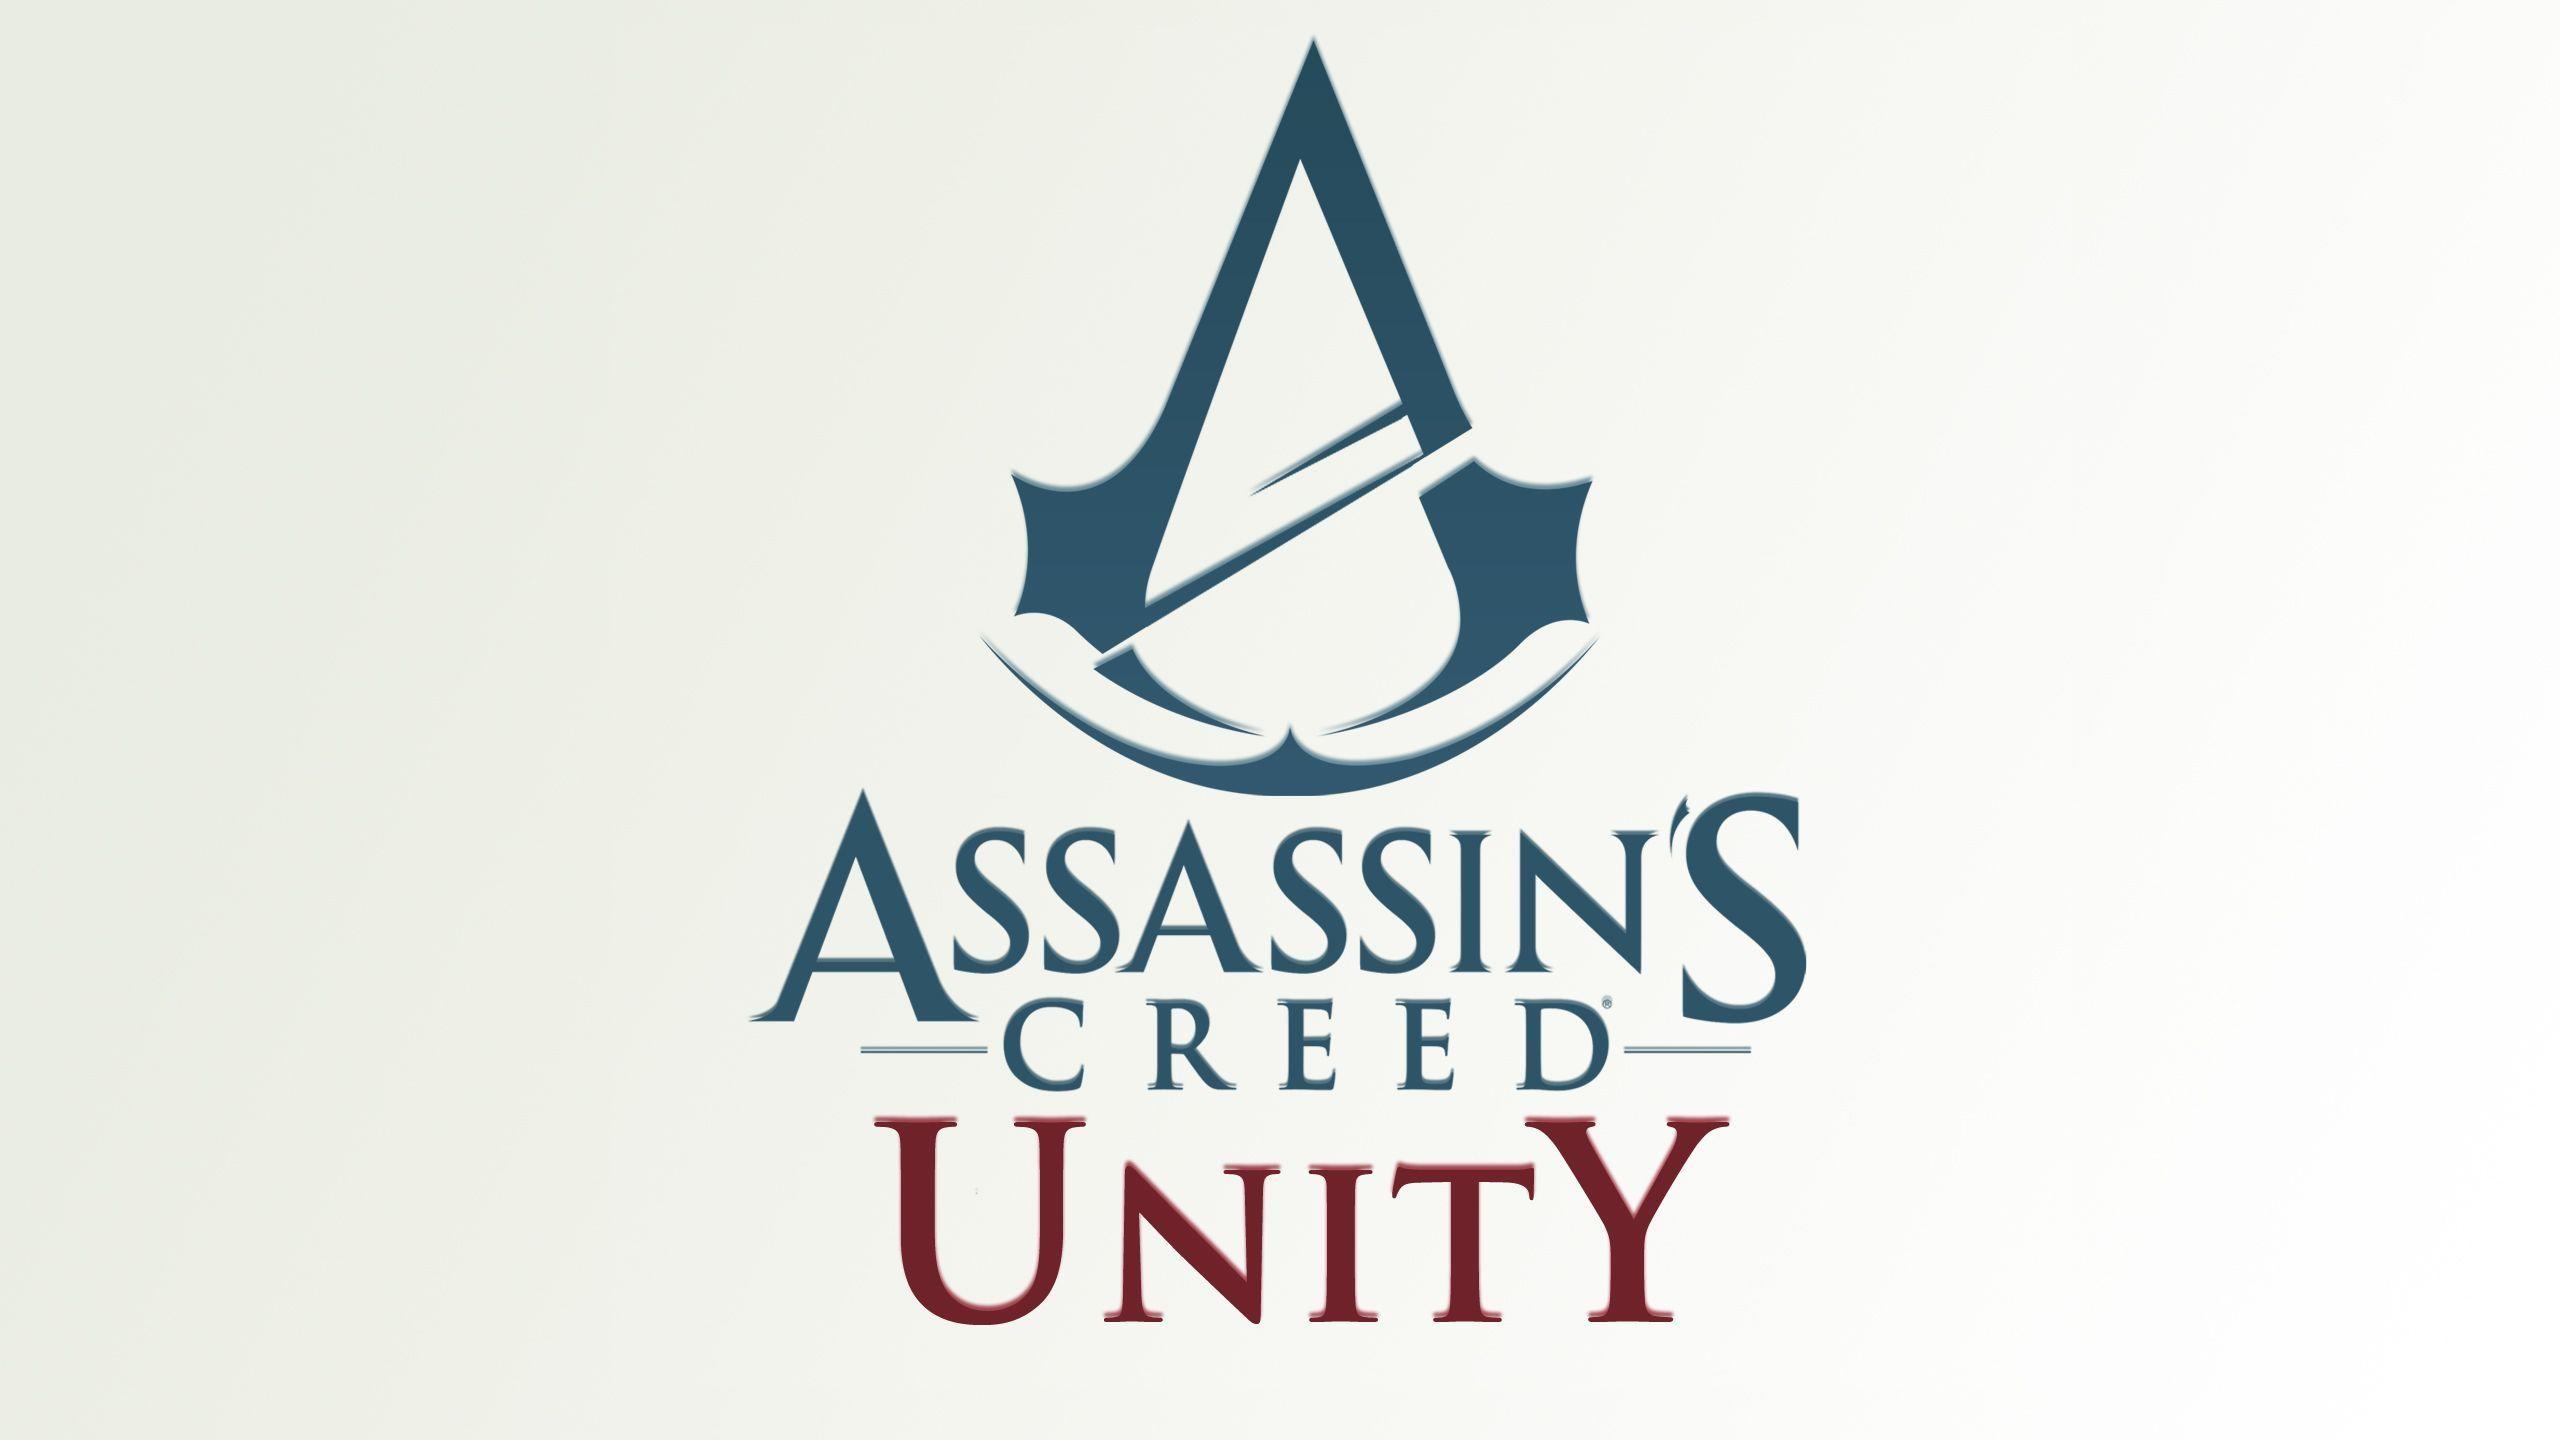 Assassins Creed Unity Logo wallpaper | | #27572